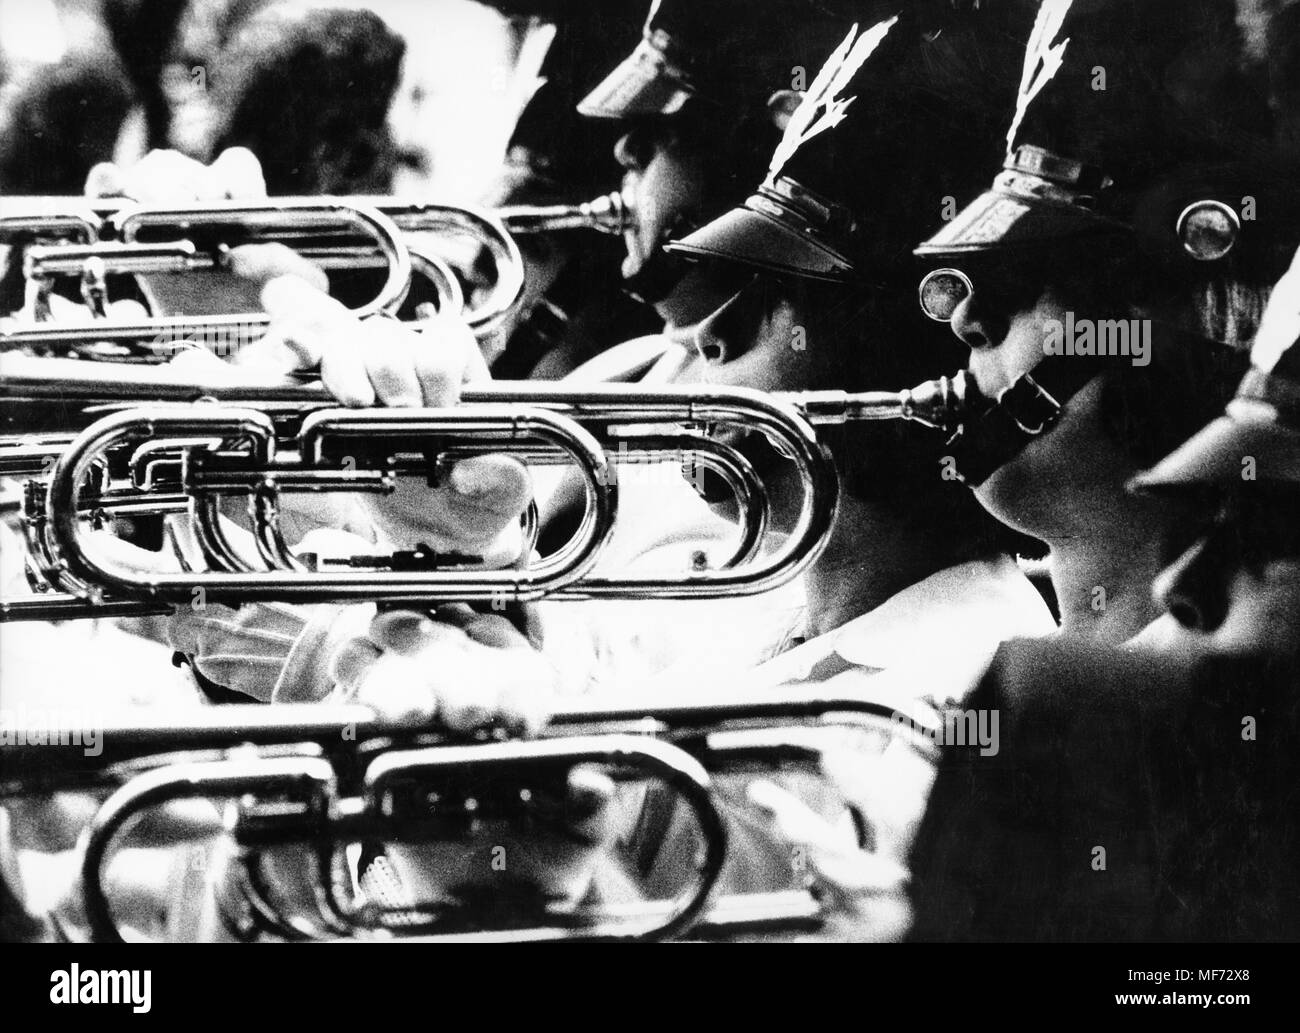 musical band, new york, 70s - Stock Image